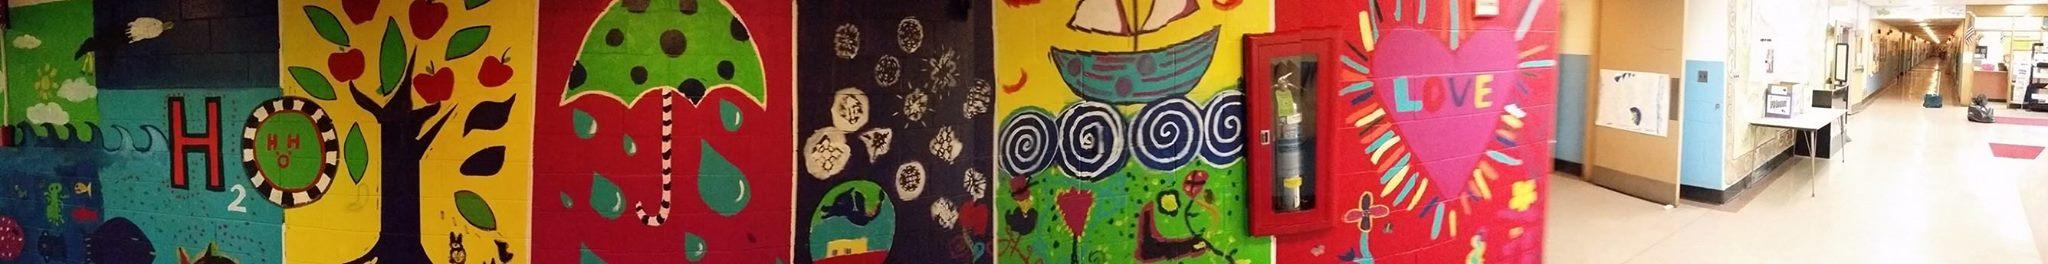 mural+at+Phoenicia+Elementary,+New+York.jpeg